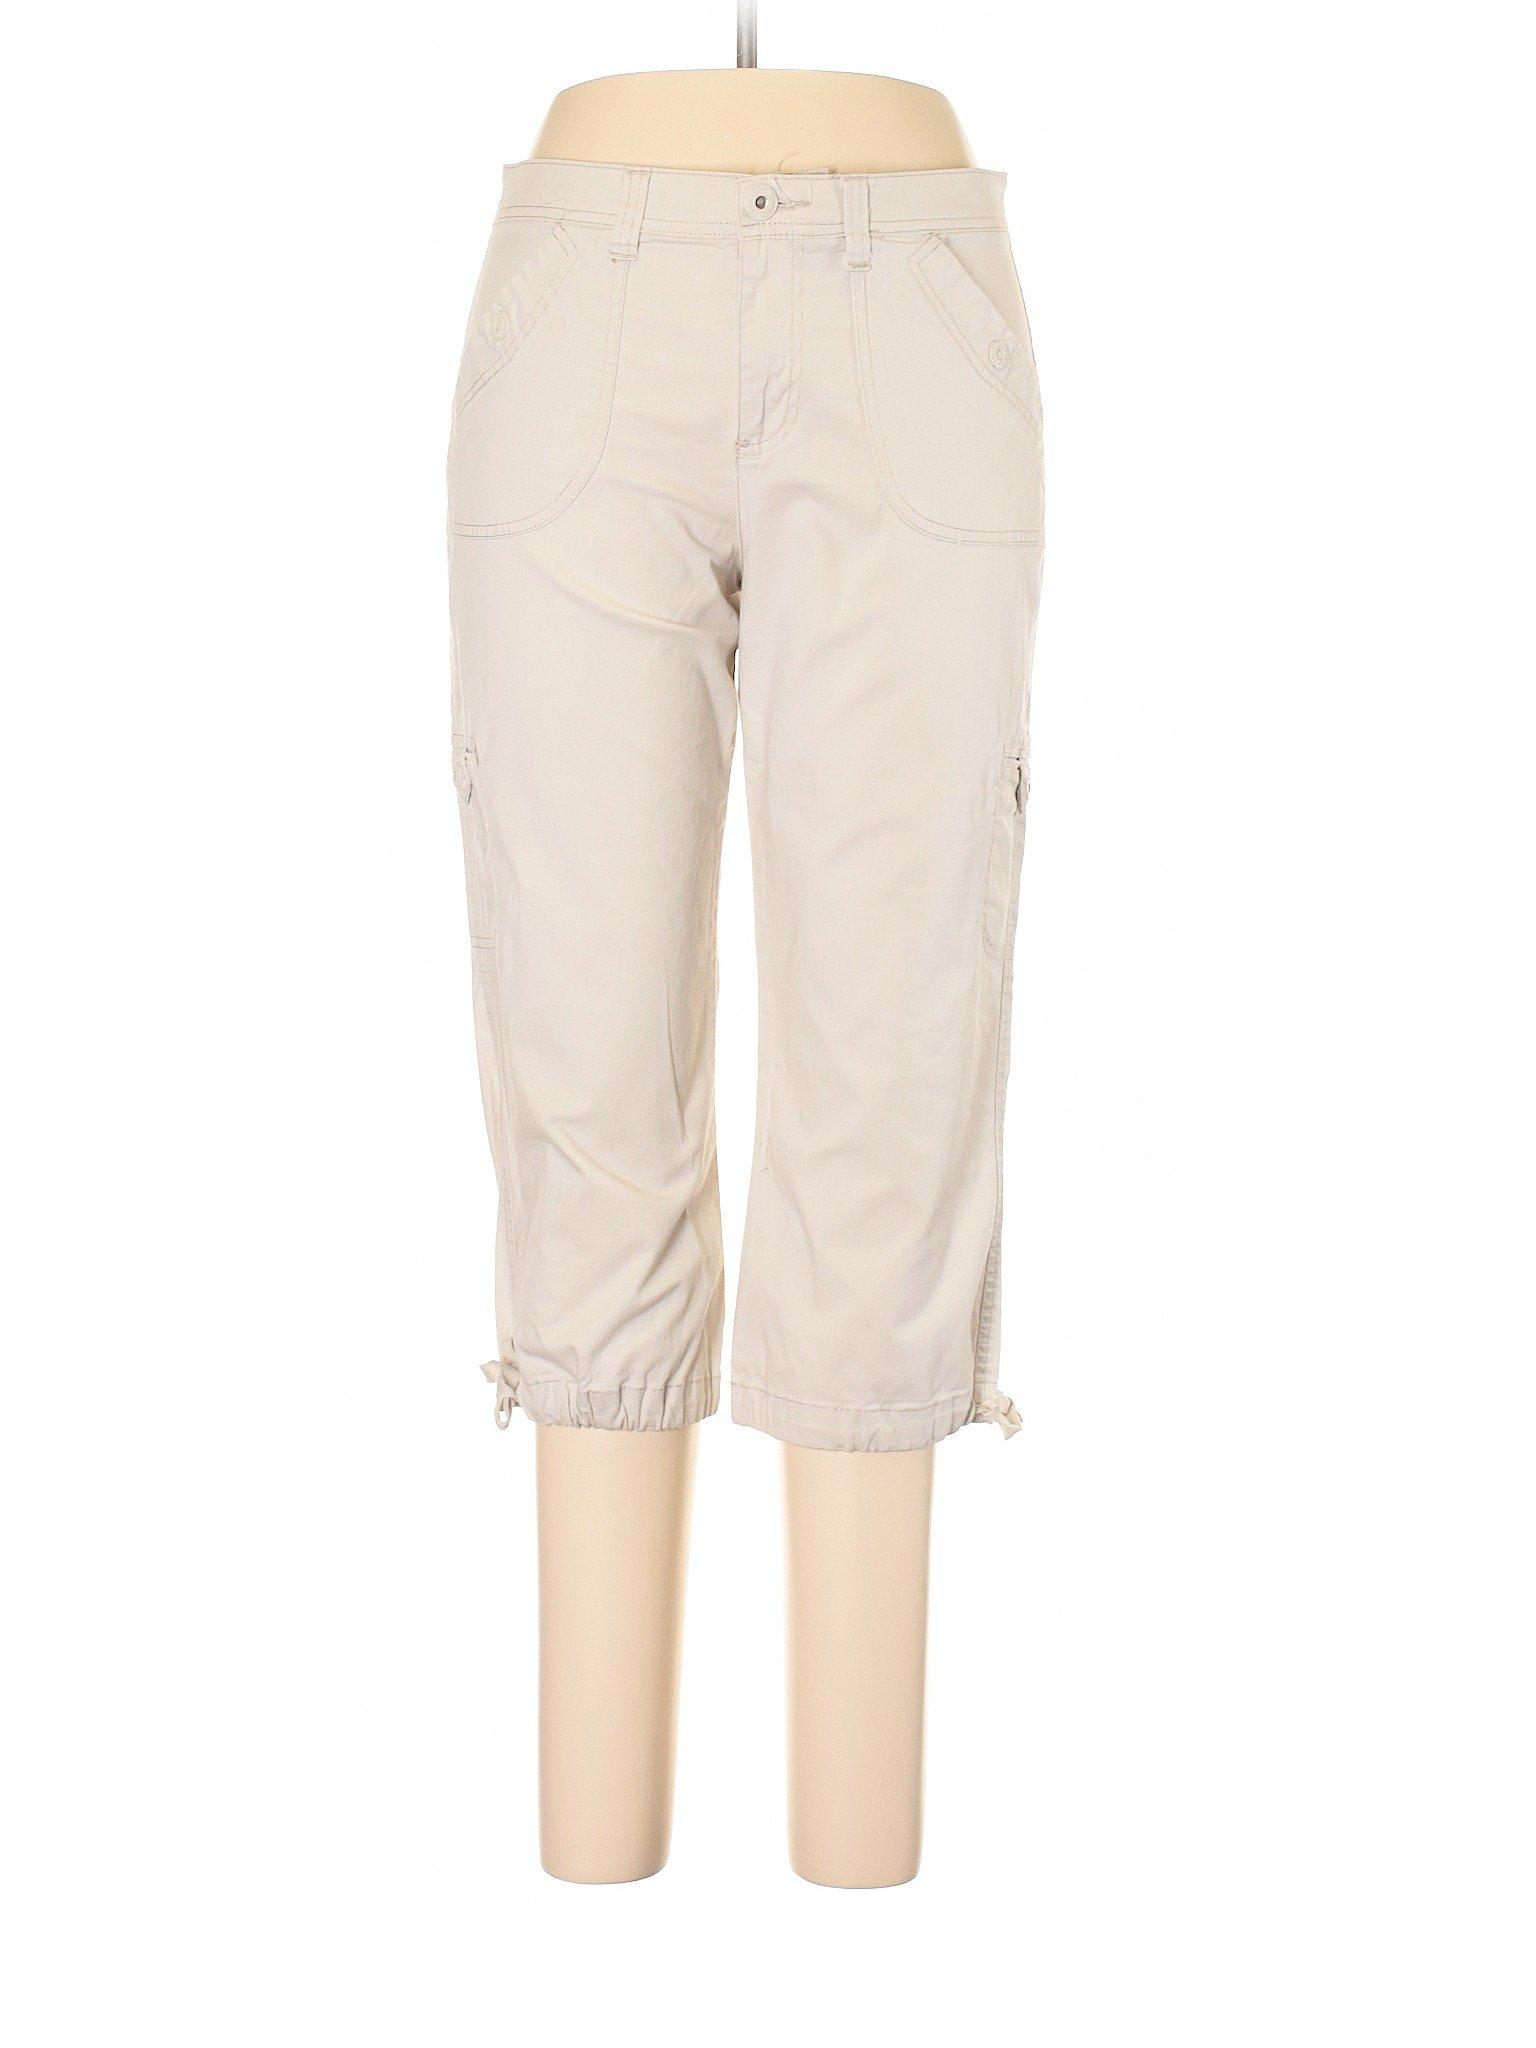 Pants Gloria Vanderbilt Leisure winter Cargo wZqFB1